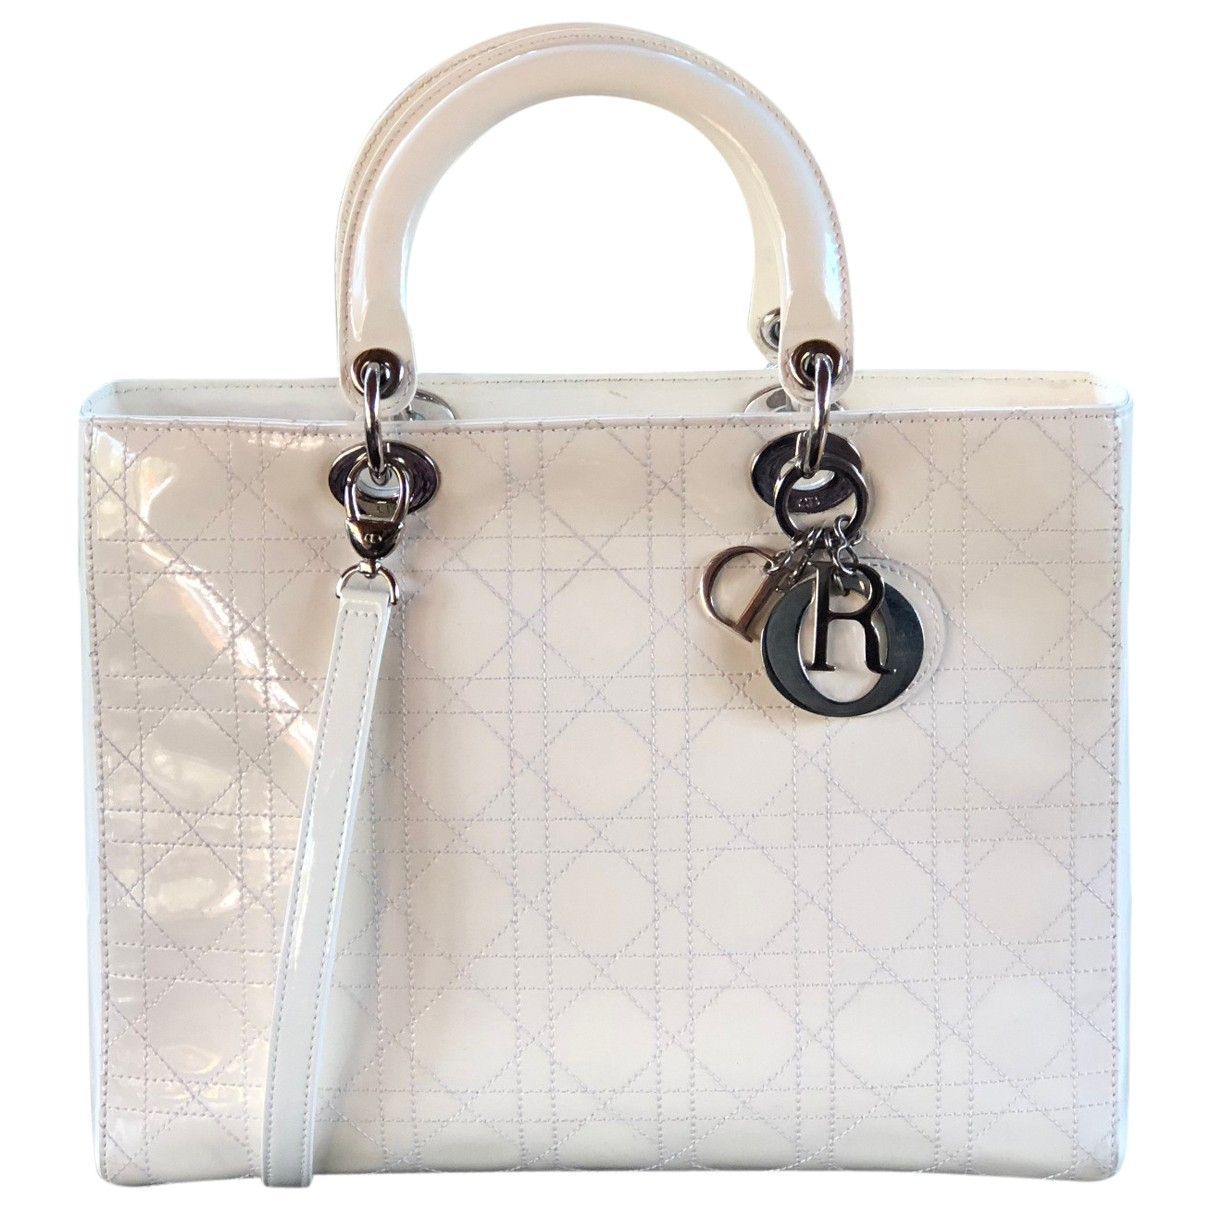 Dior \N Handtasche in  Ecru Lackleder